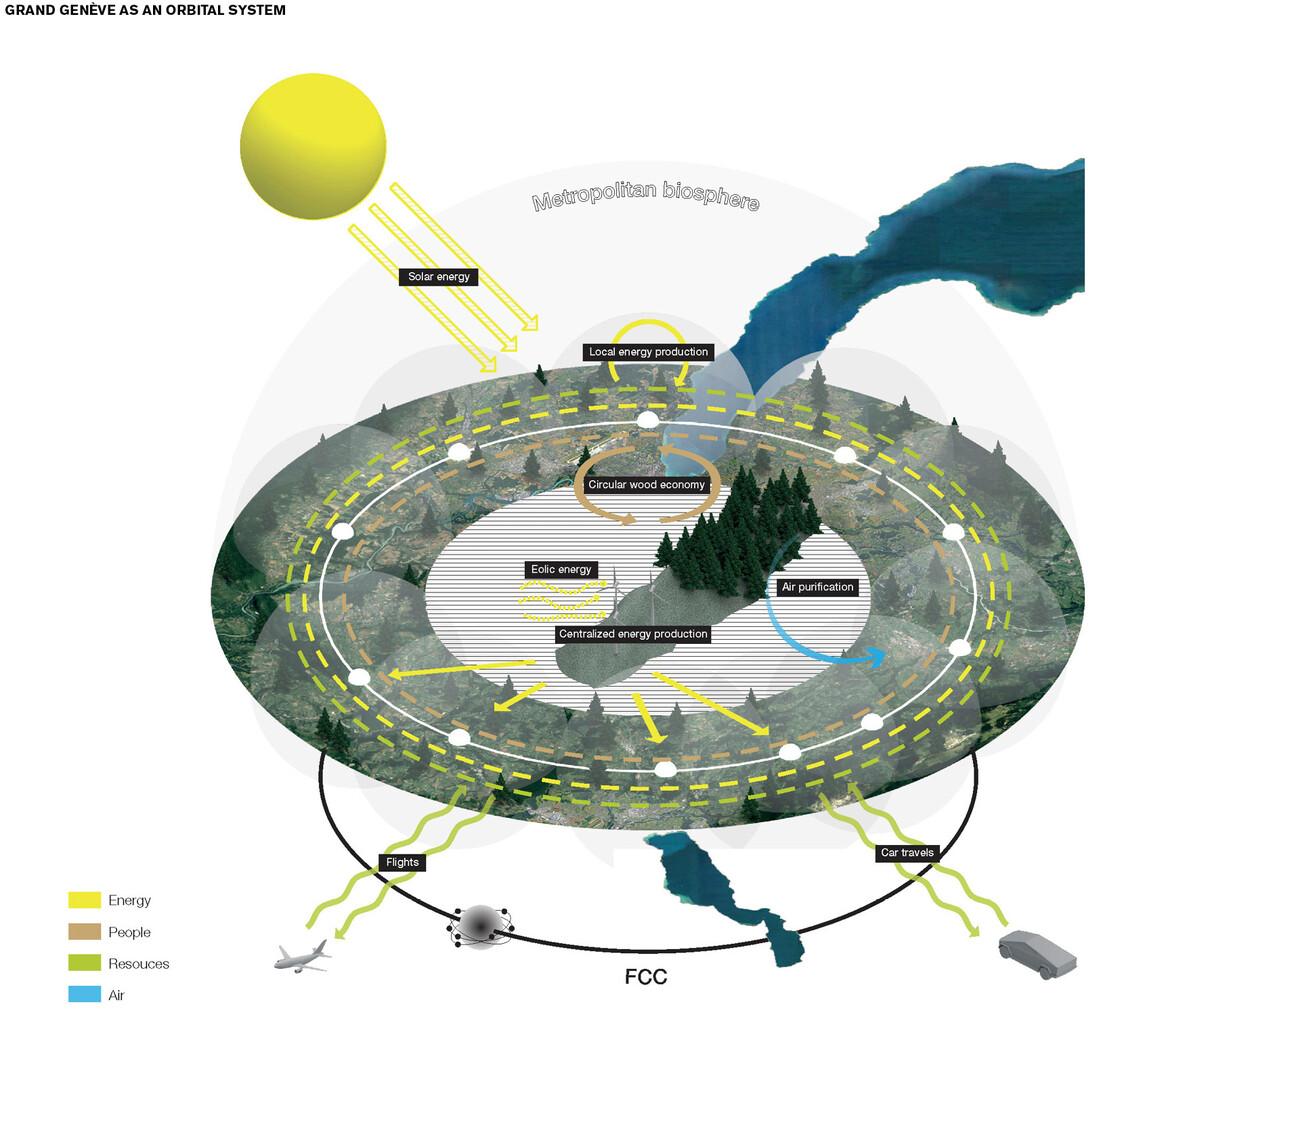 Grand Geneva 2050 Masterplan